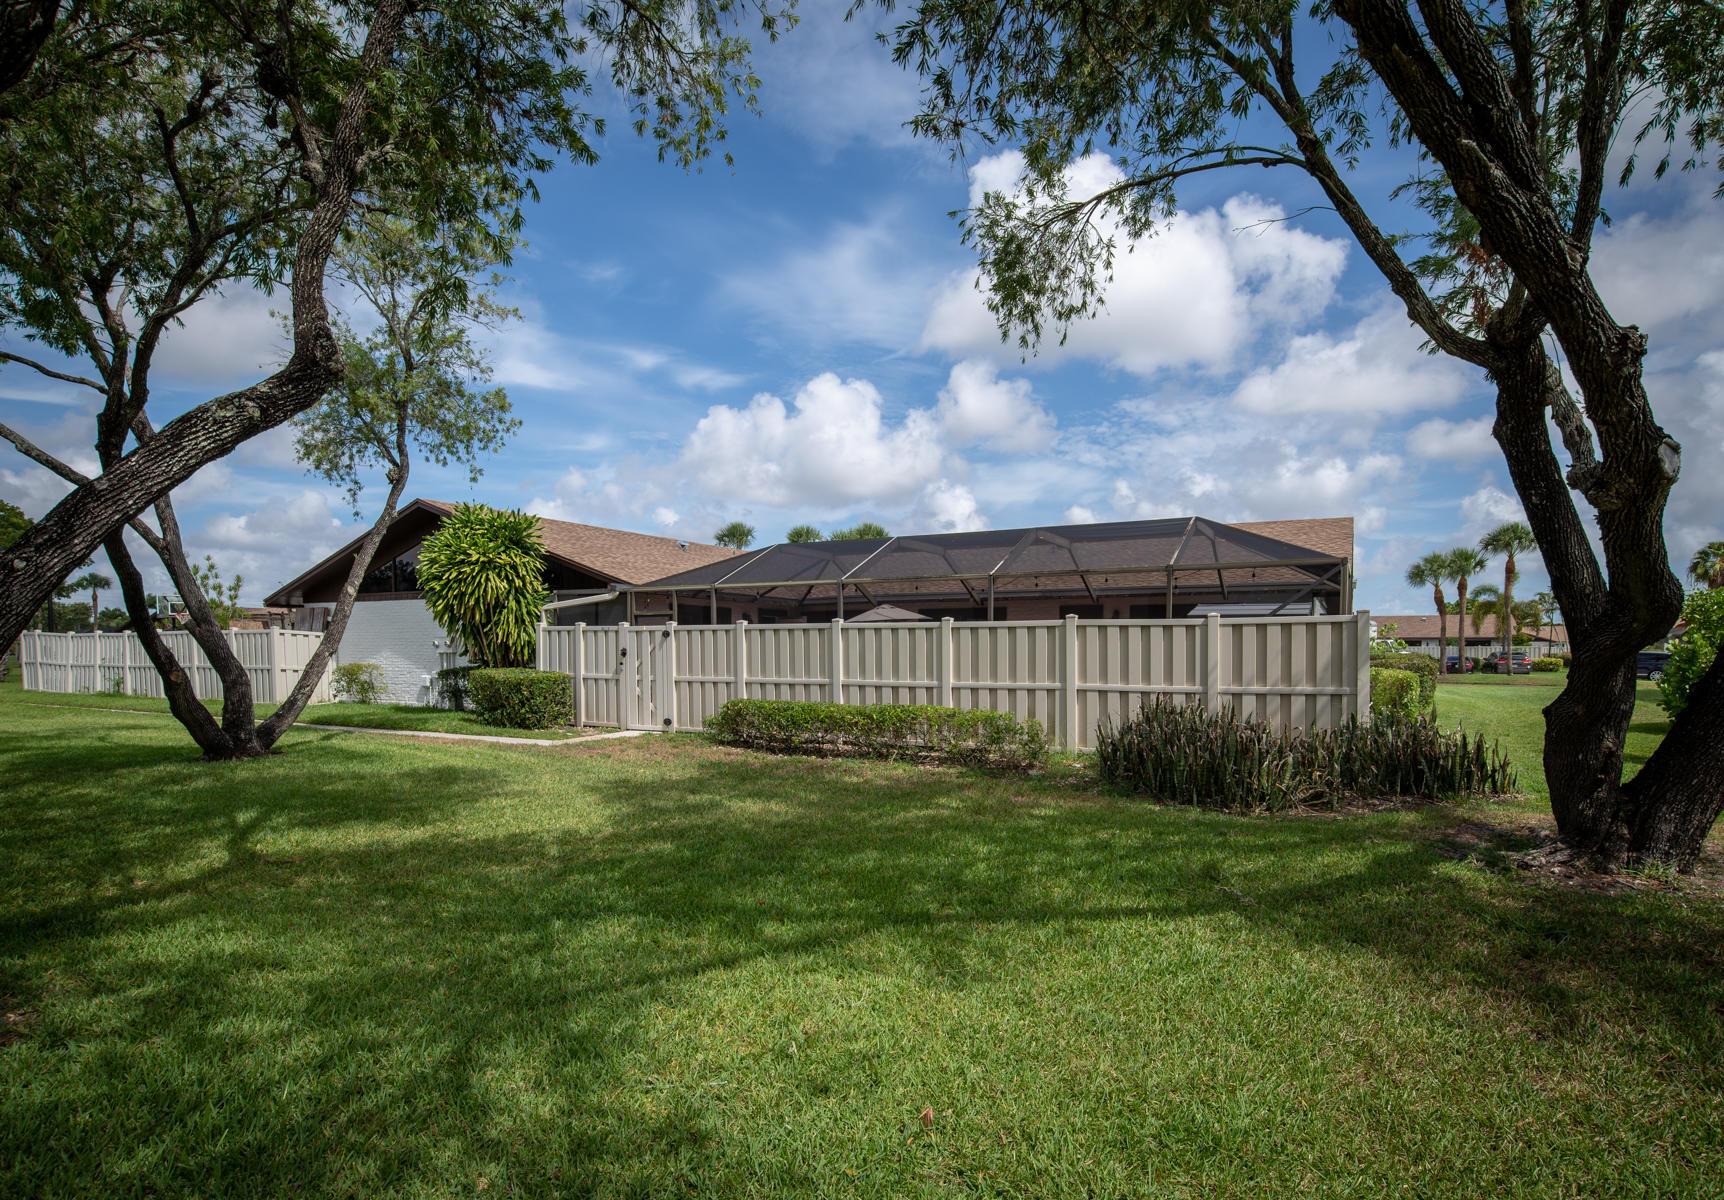 9854  Boca Gardens Trail C For Sale 10723113, FL